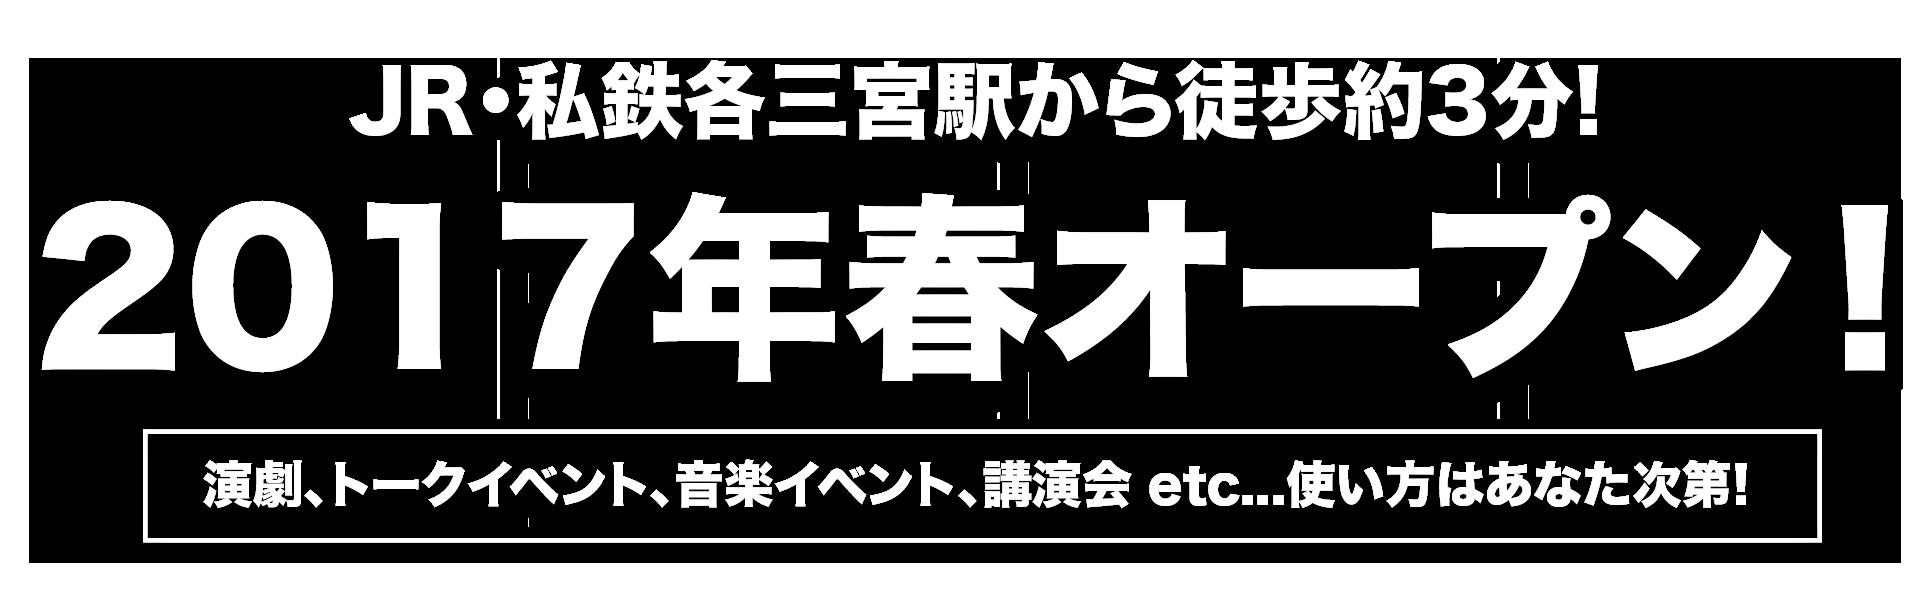 JR・私鉄各三宮駅から徒歩約3分! 2017年春オープン! 演劇、トークイベント、音楽イベント、講演会 etc. 使い方はあなた次第!